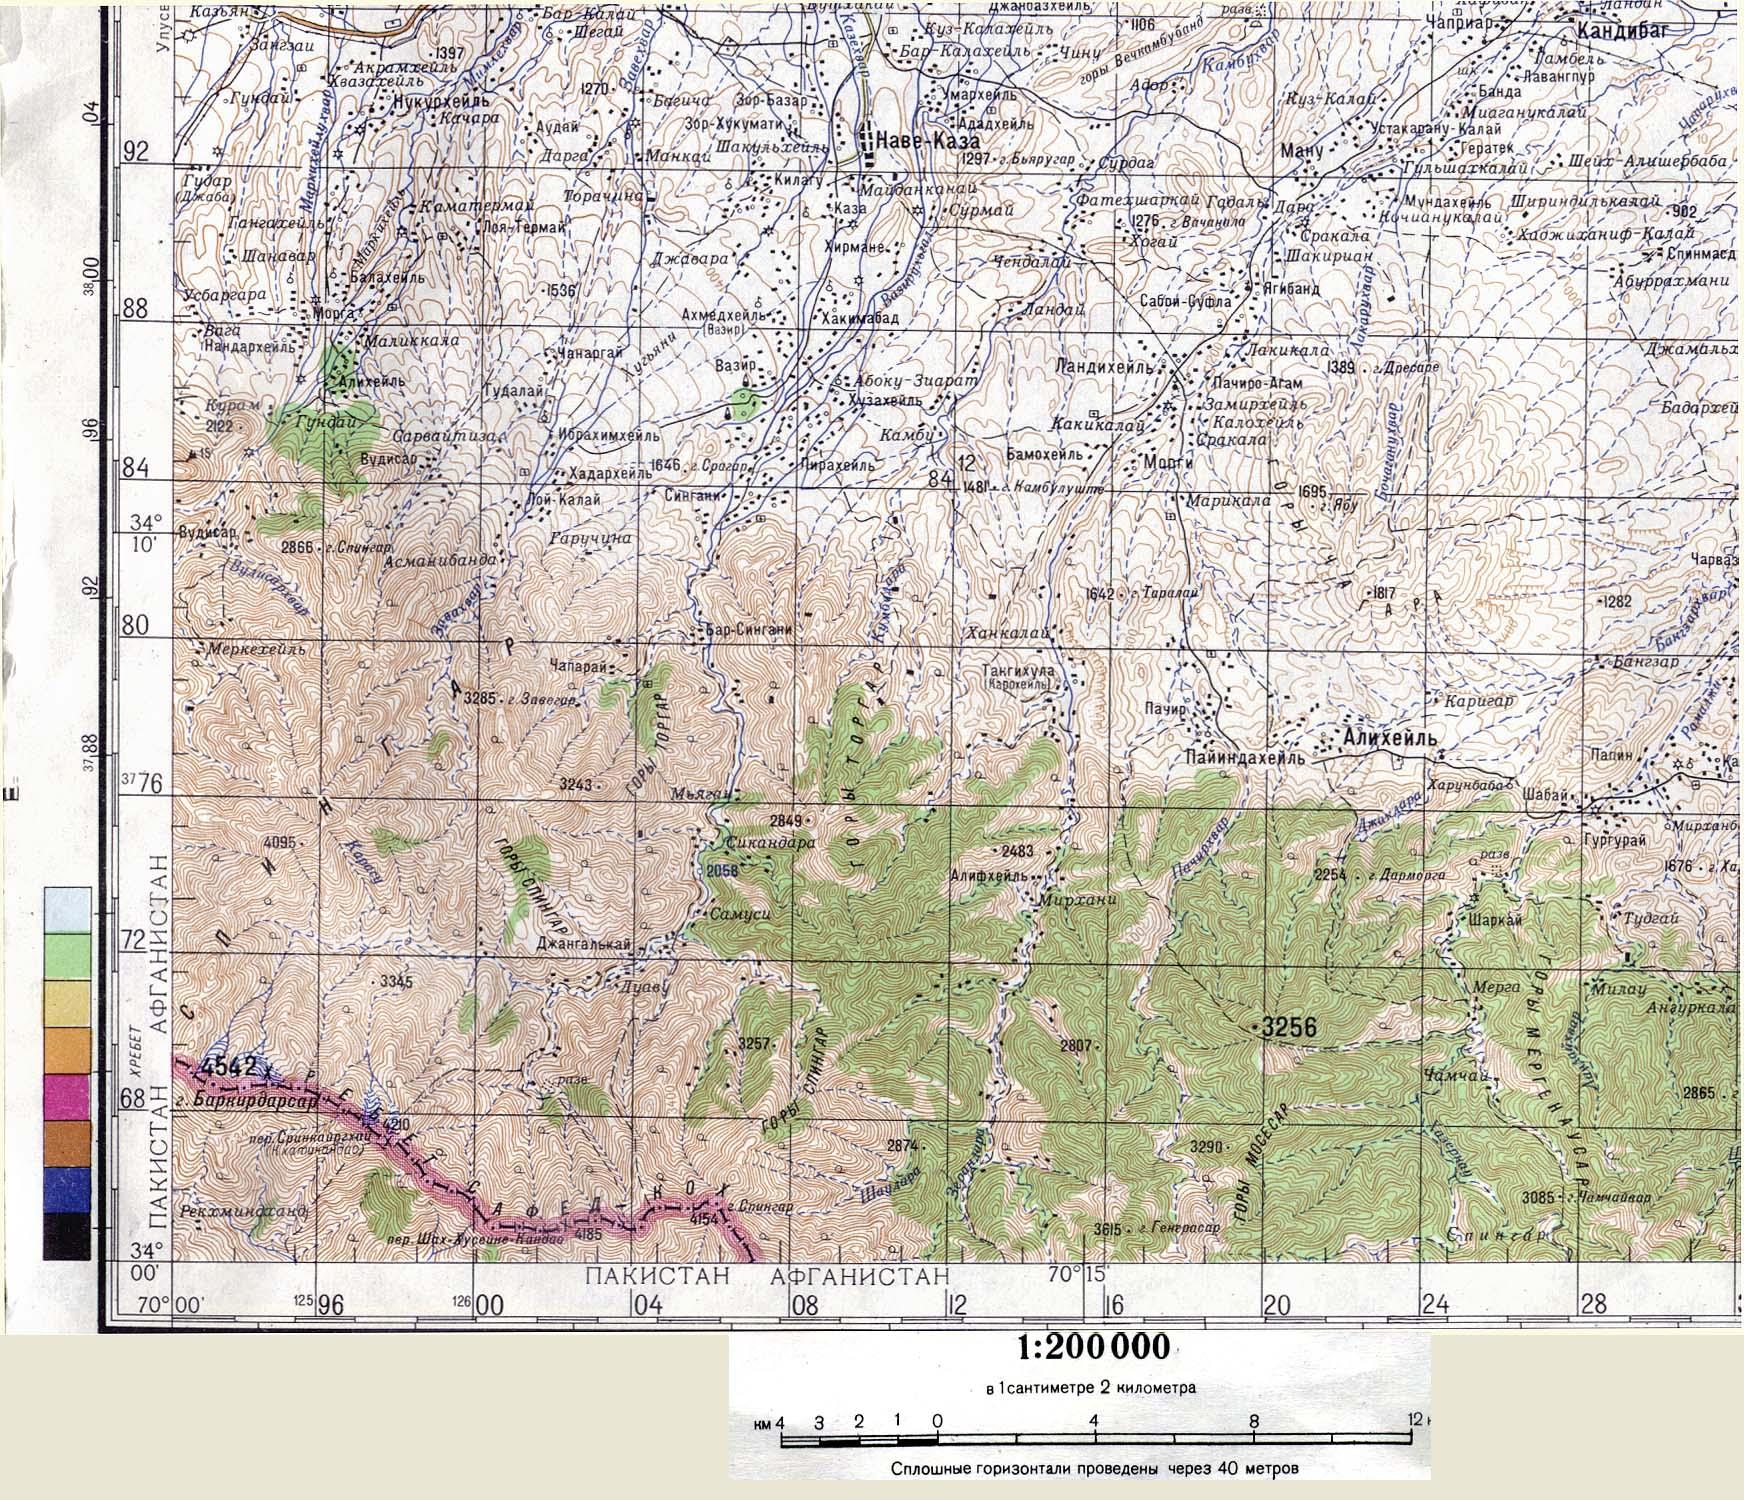 Mapa Topográfico de la Región de Tora Bora, Afganistán